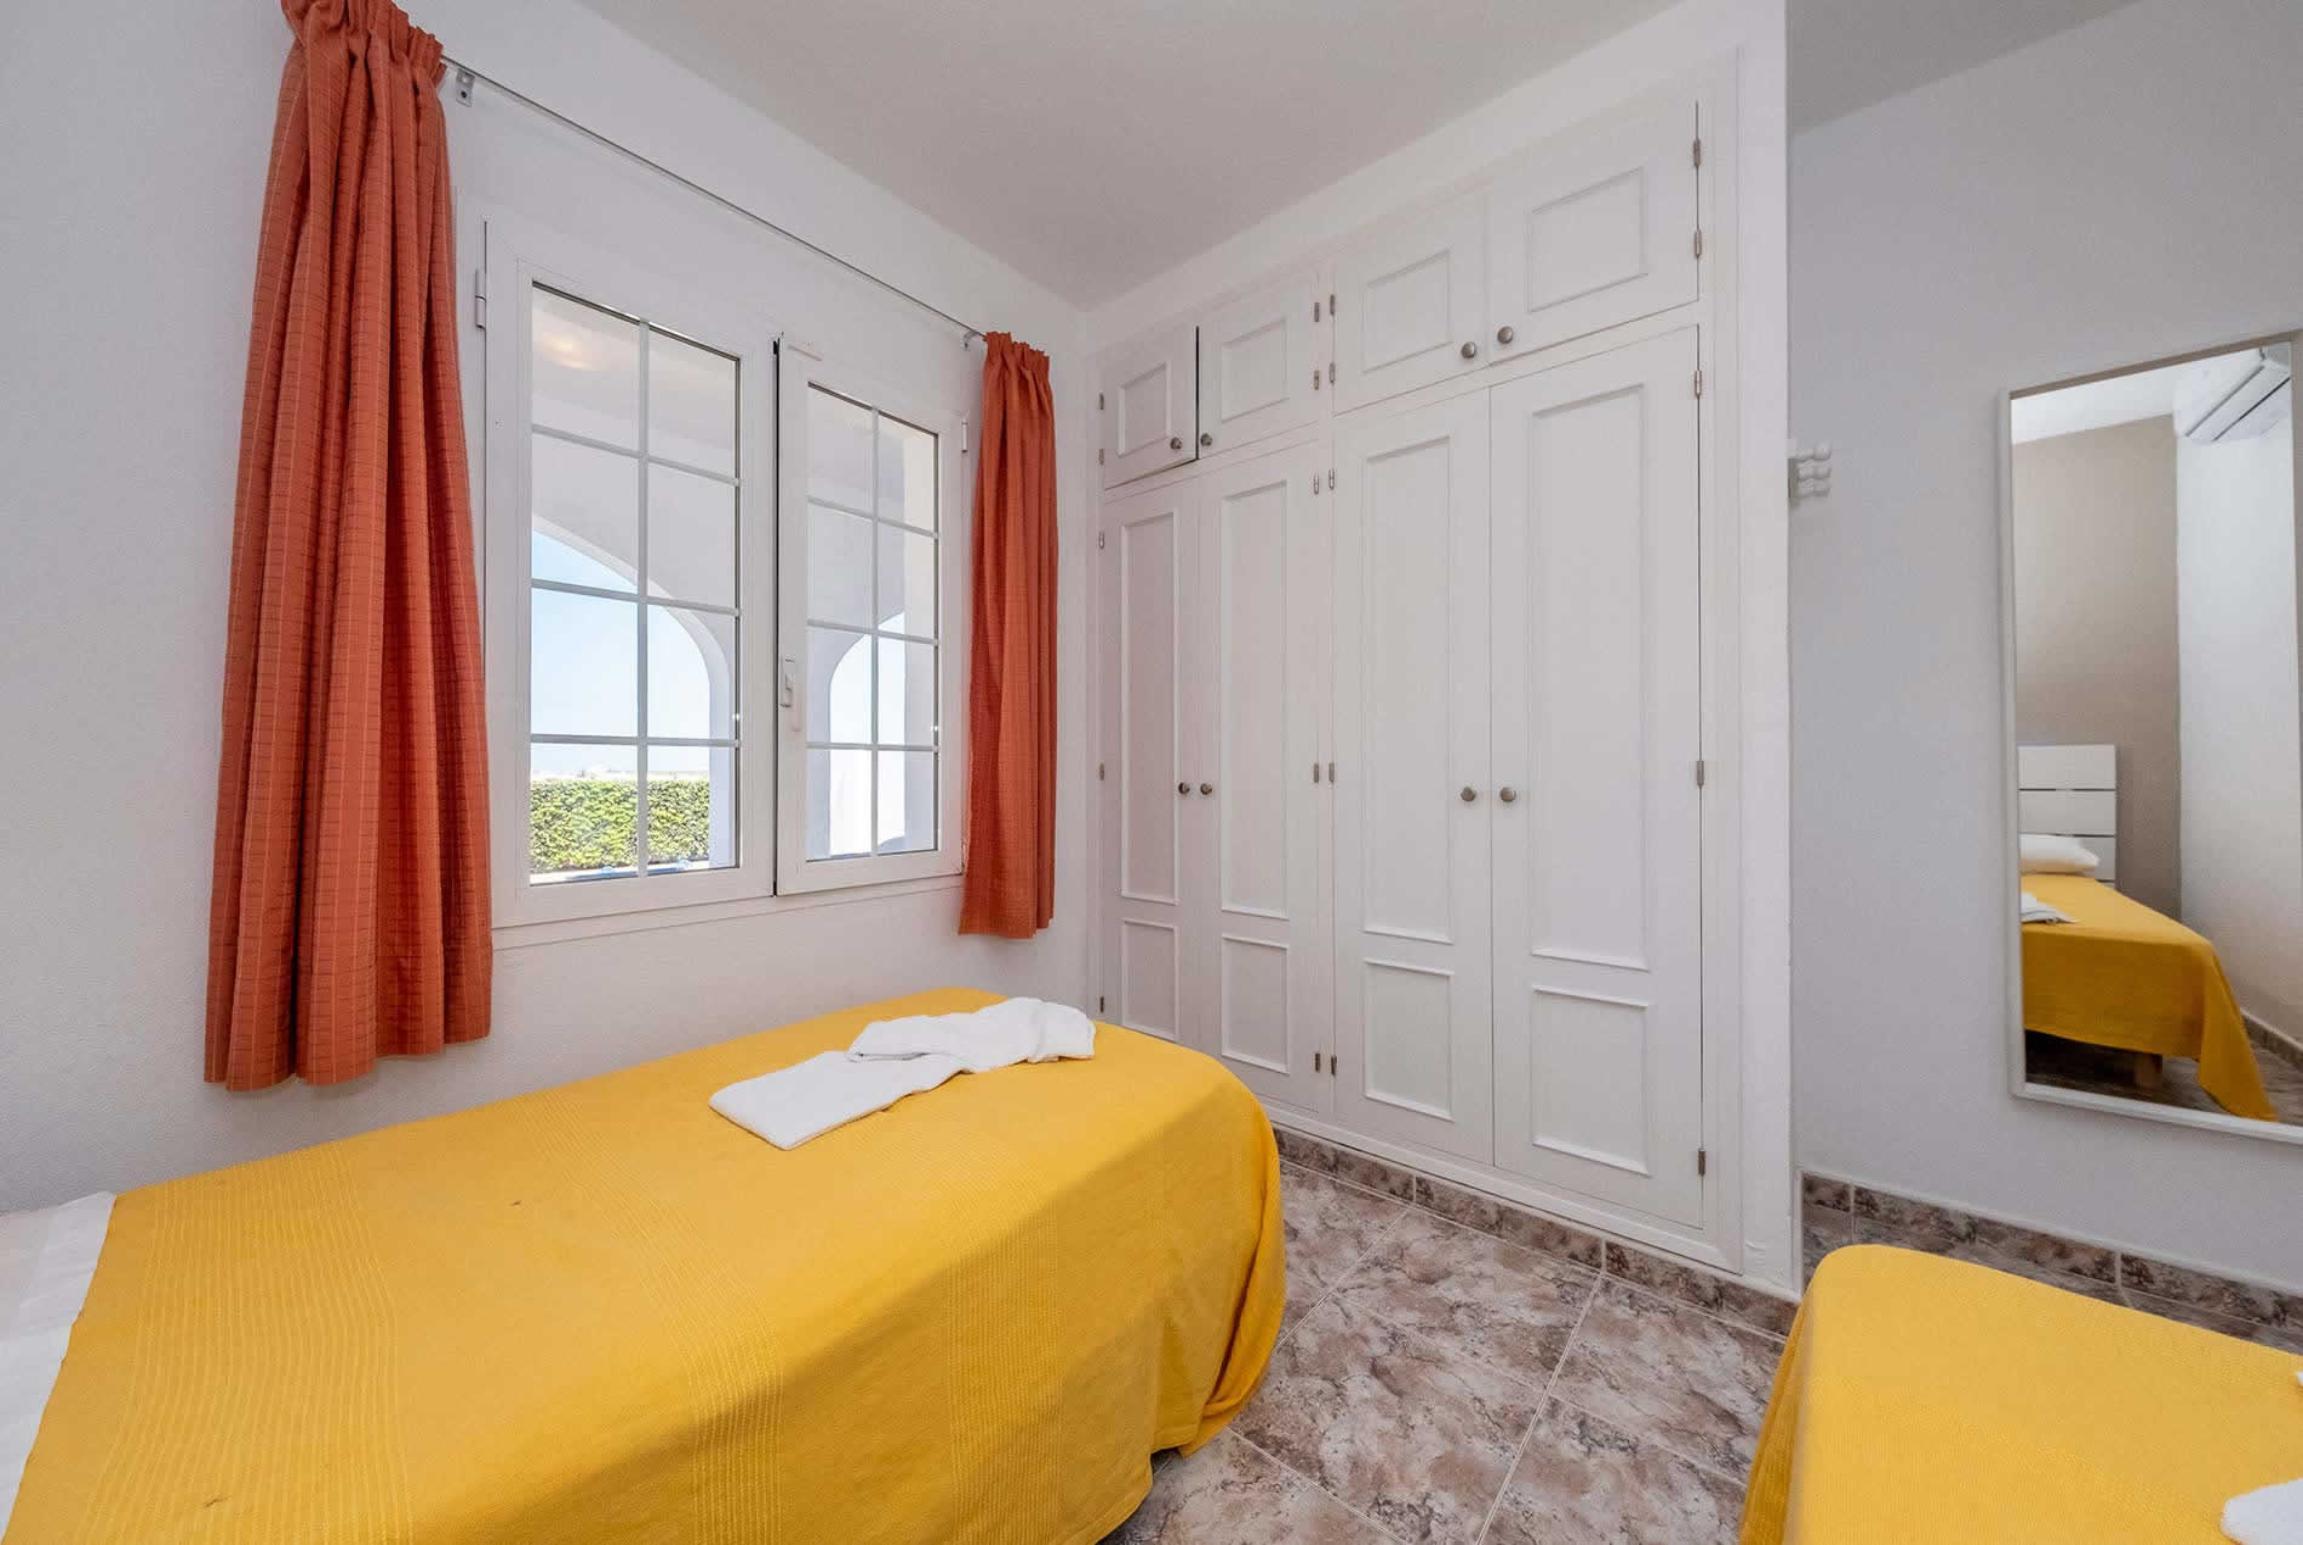 Ferienhaus Bellavista I (2654269), Arenal De'N Castell, Menorca, Balearische Inseln, Spanien, Bild 27